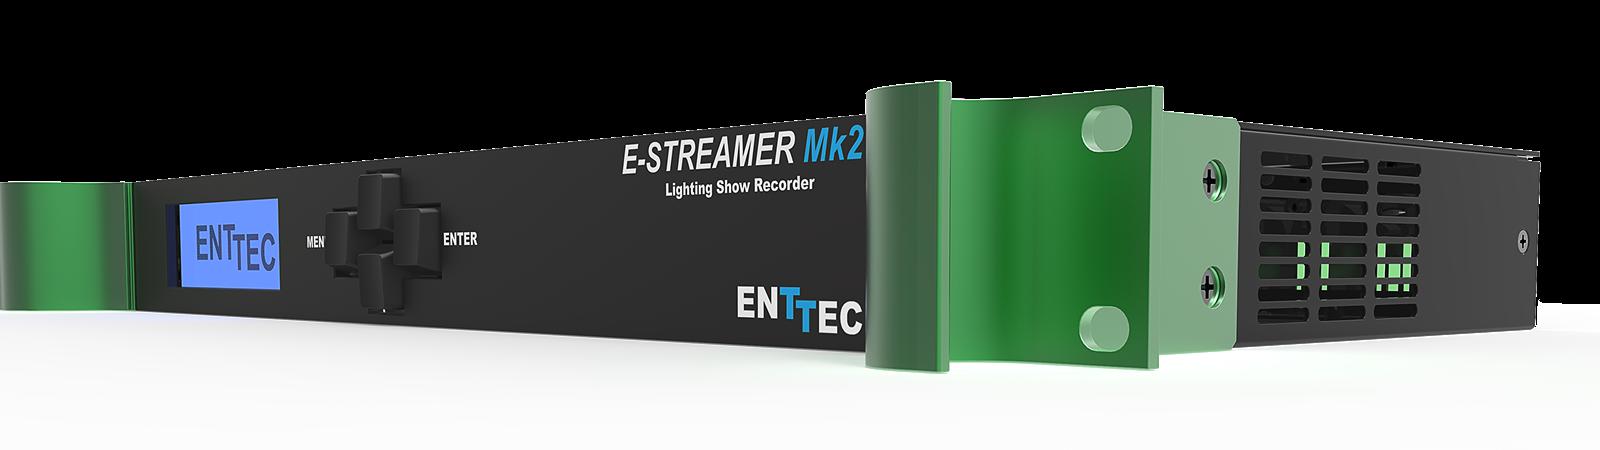 E-Streamer Mk2 | ENTTEC